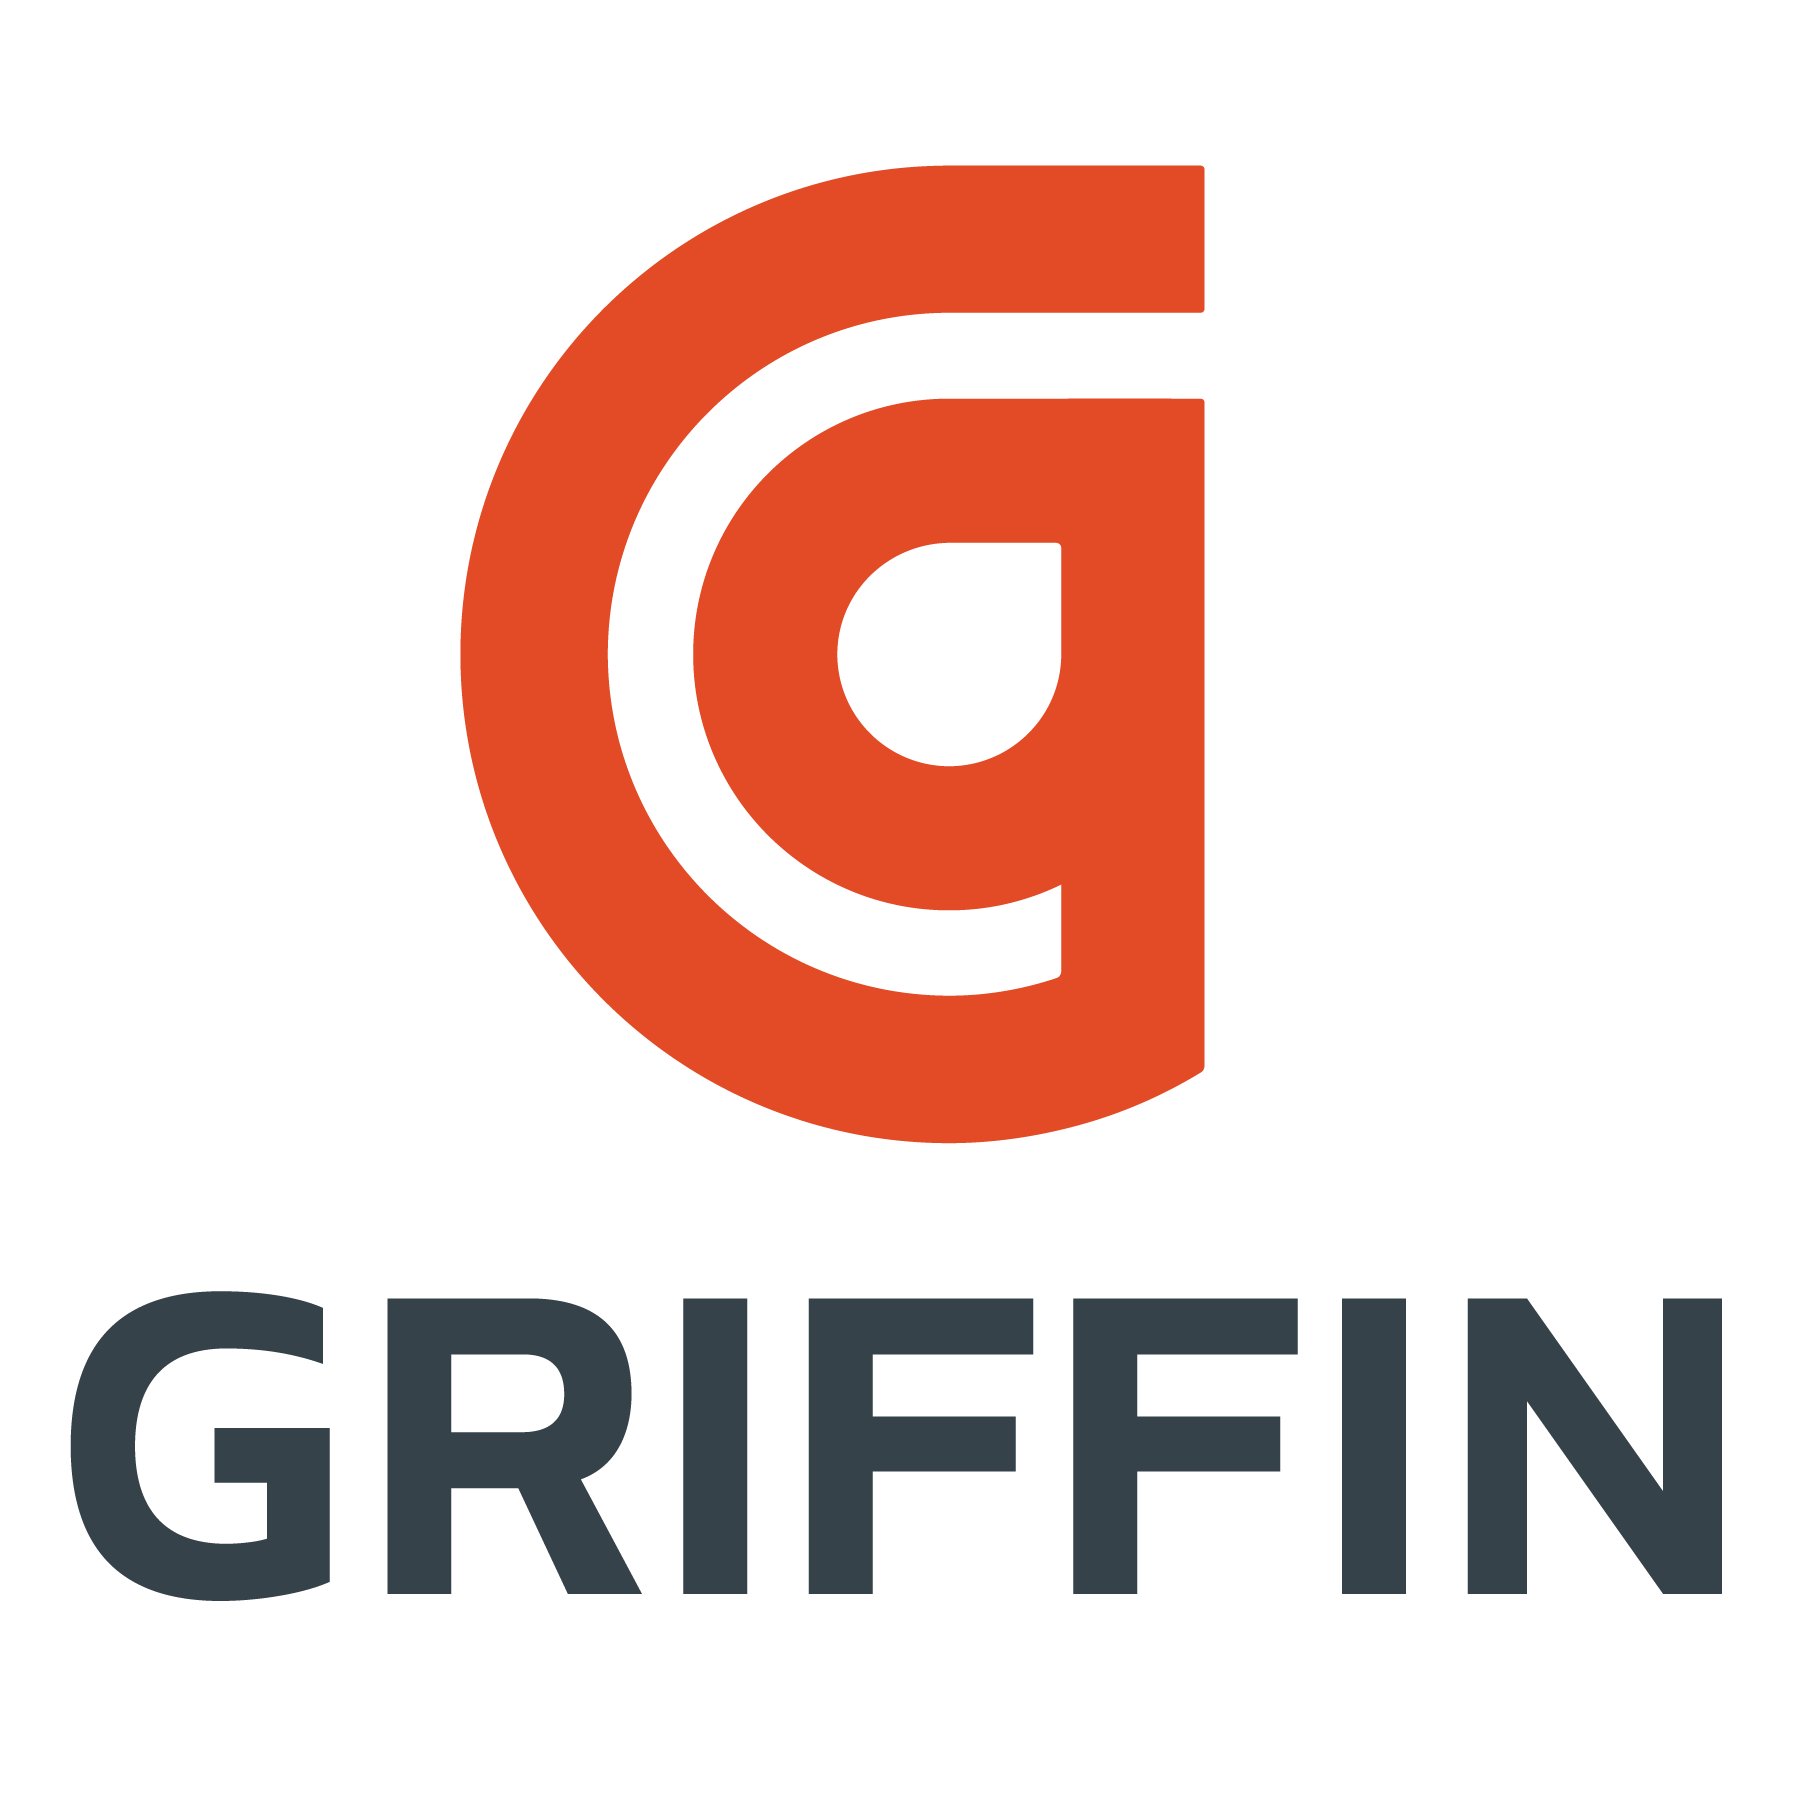 Griffin Logo Wallpaper